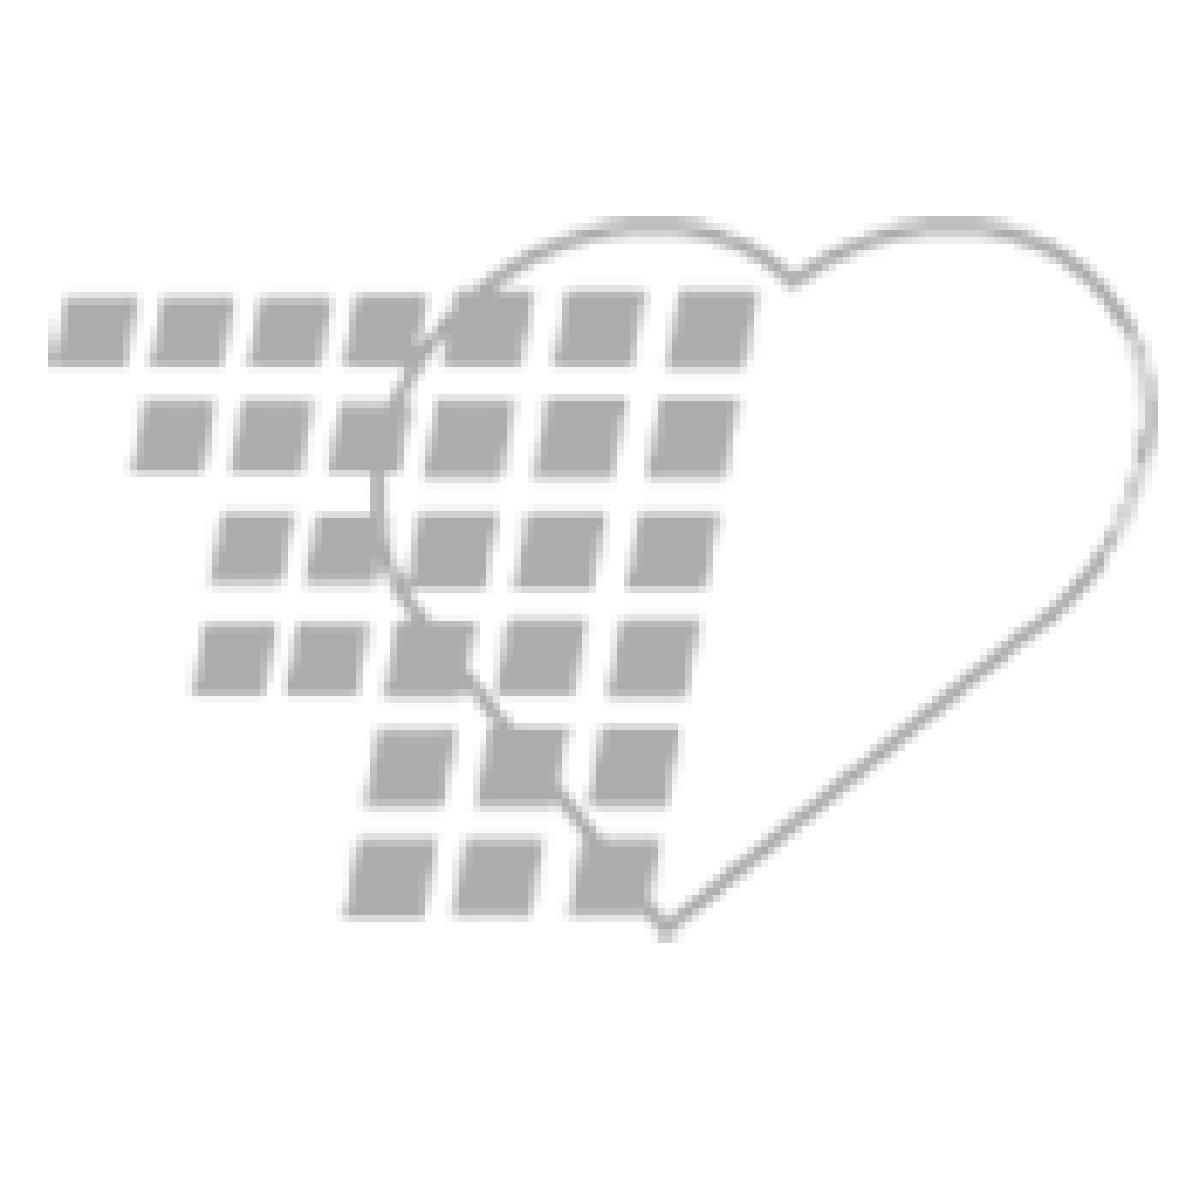 06-93-0072 - Demo Dose® Cymbalt 60 mg - 100 Pills/Bottle